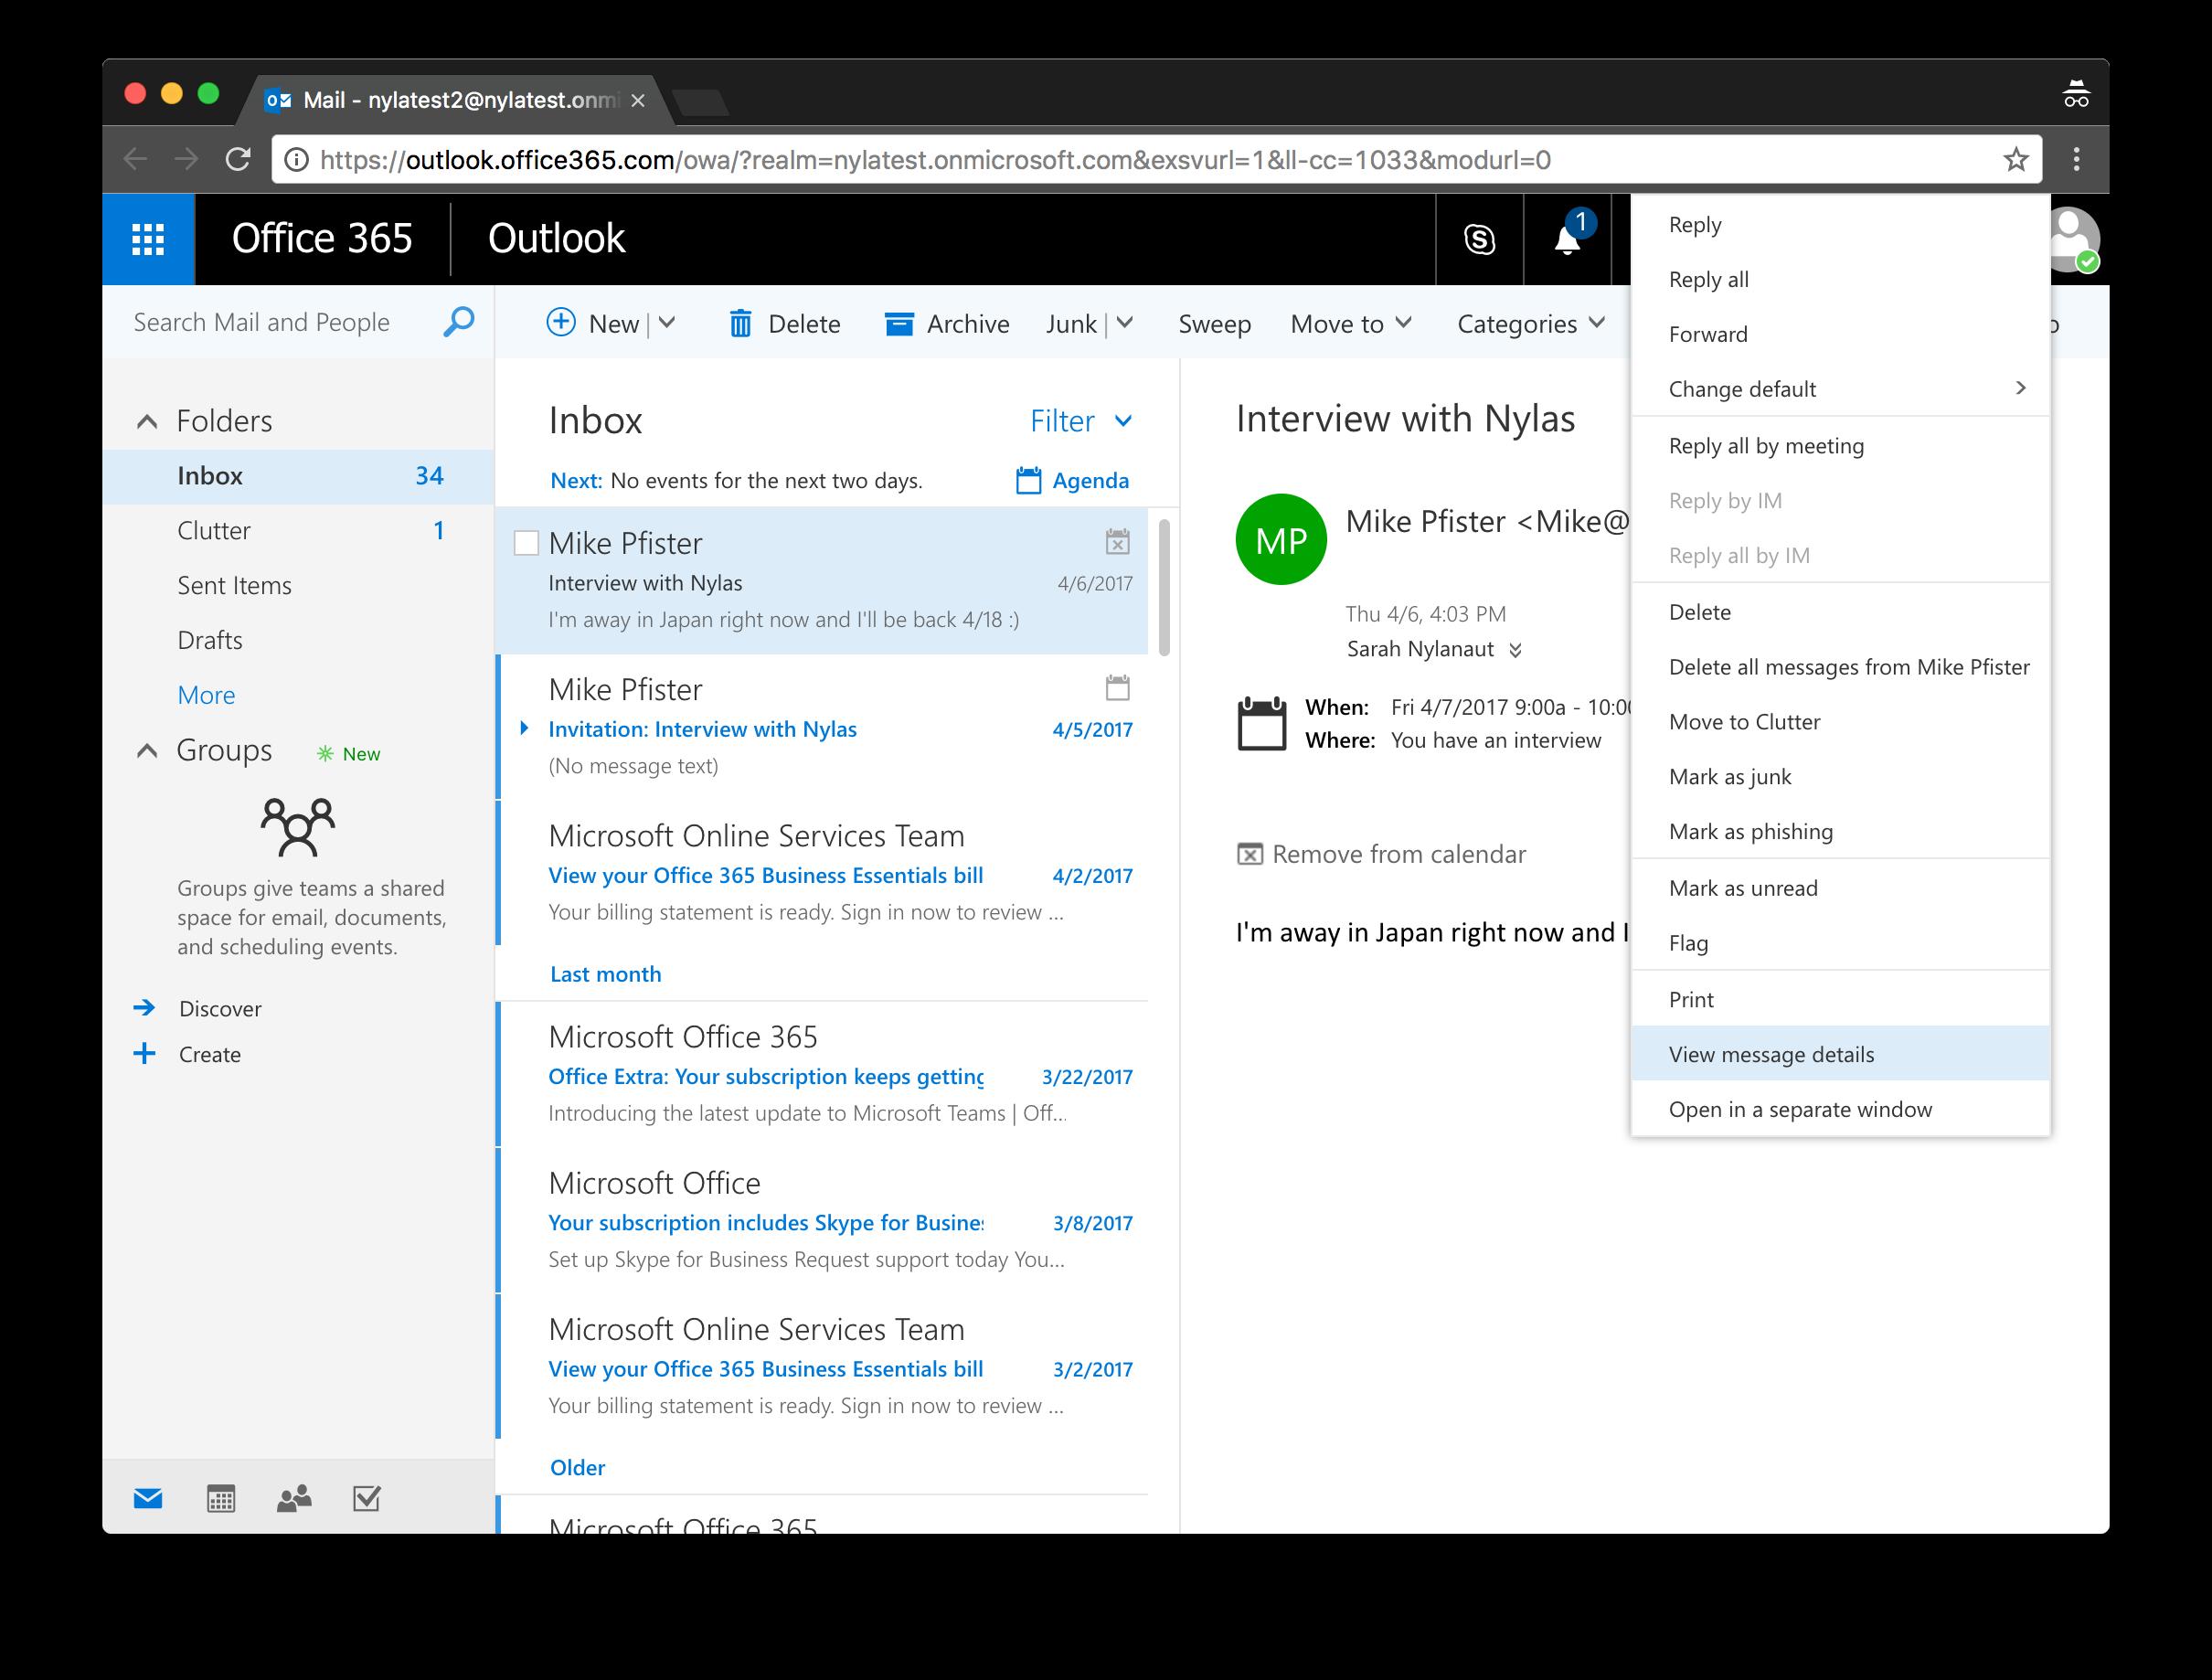 Outlook Message Details